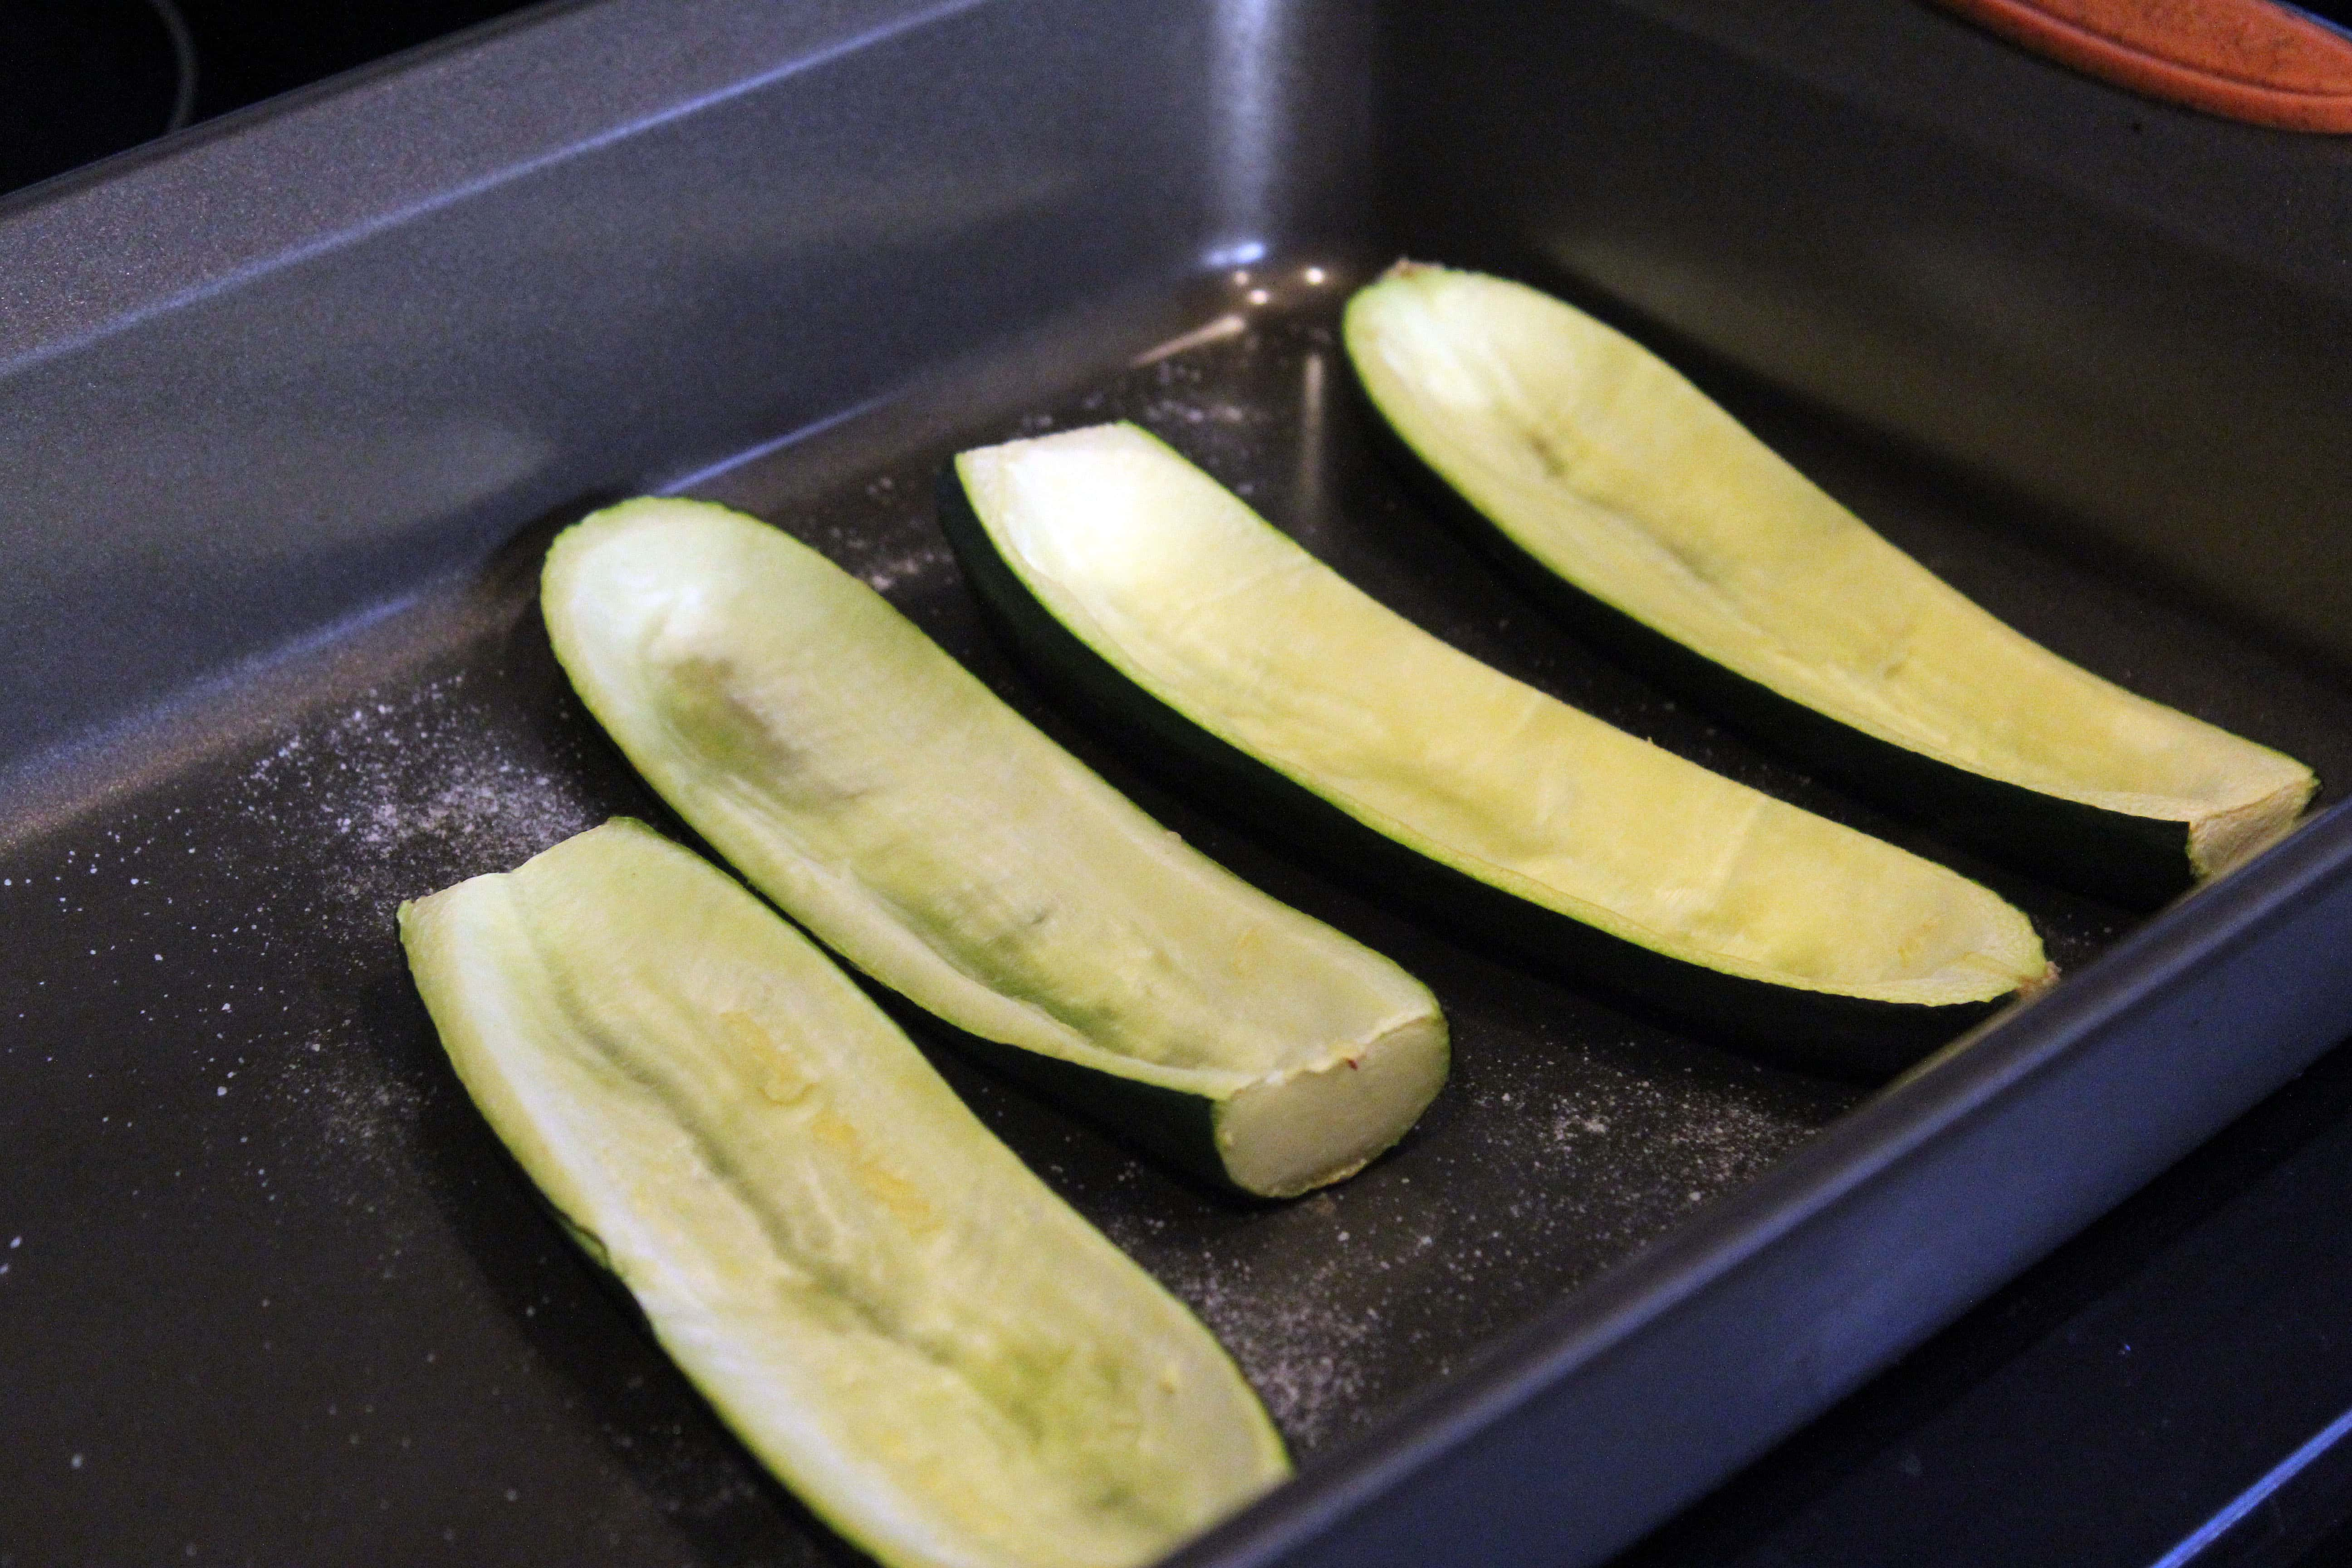 Slightly roasted zucchini